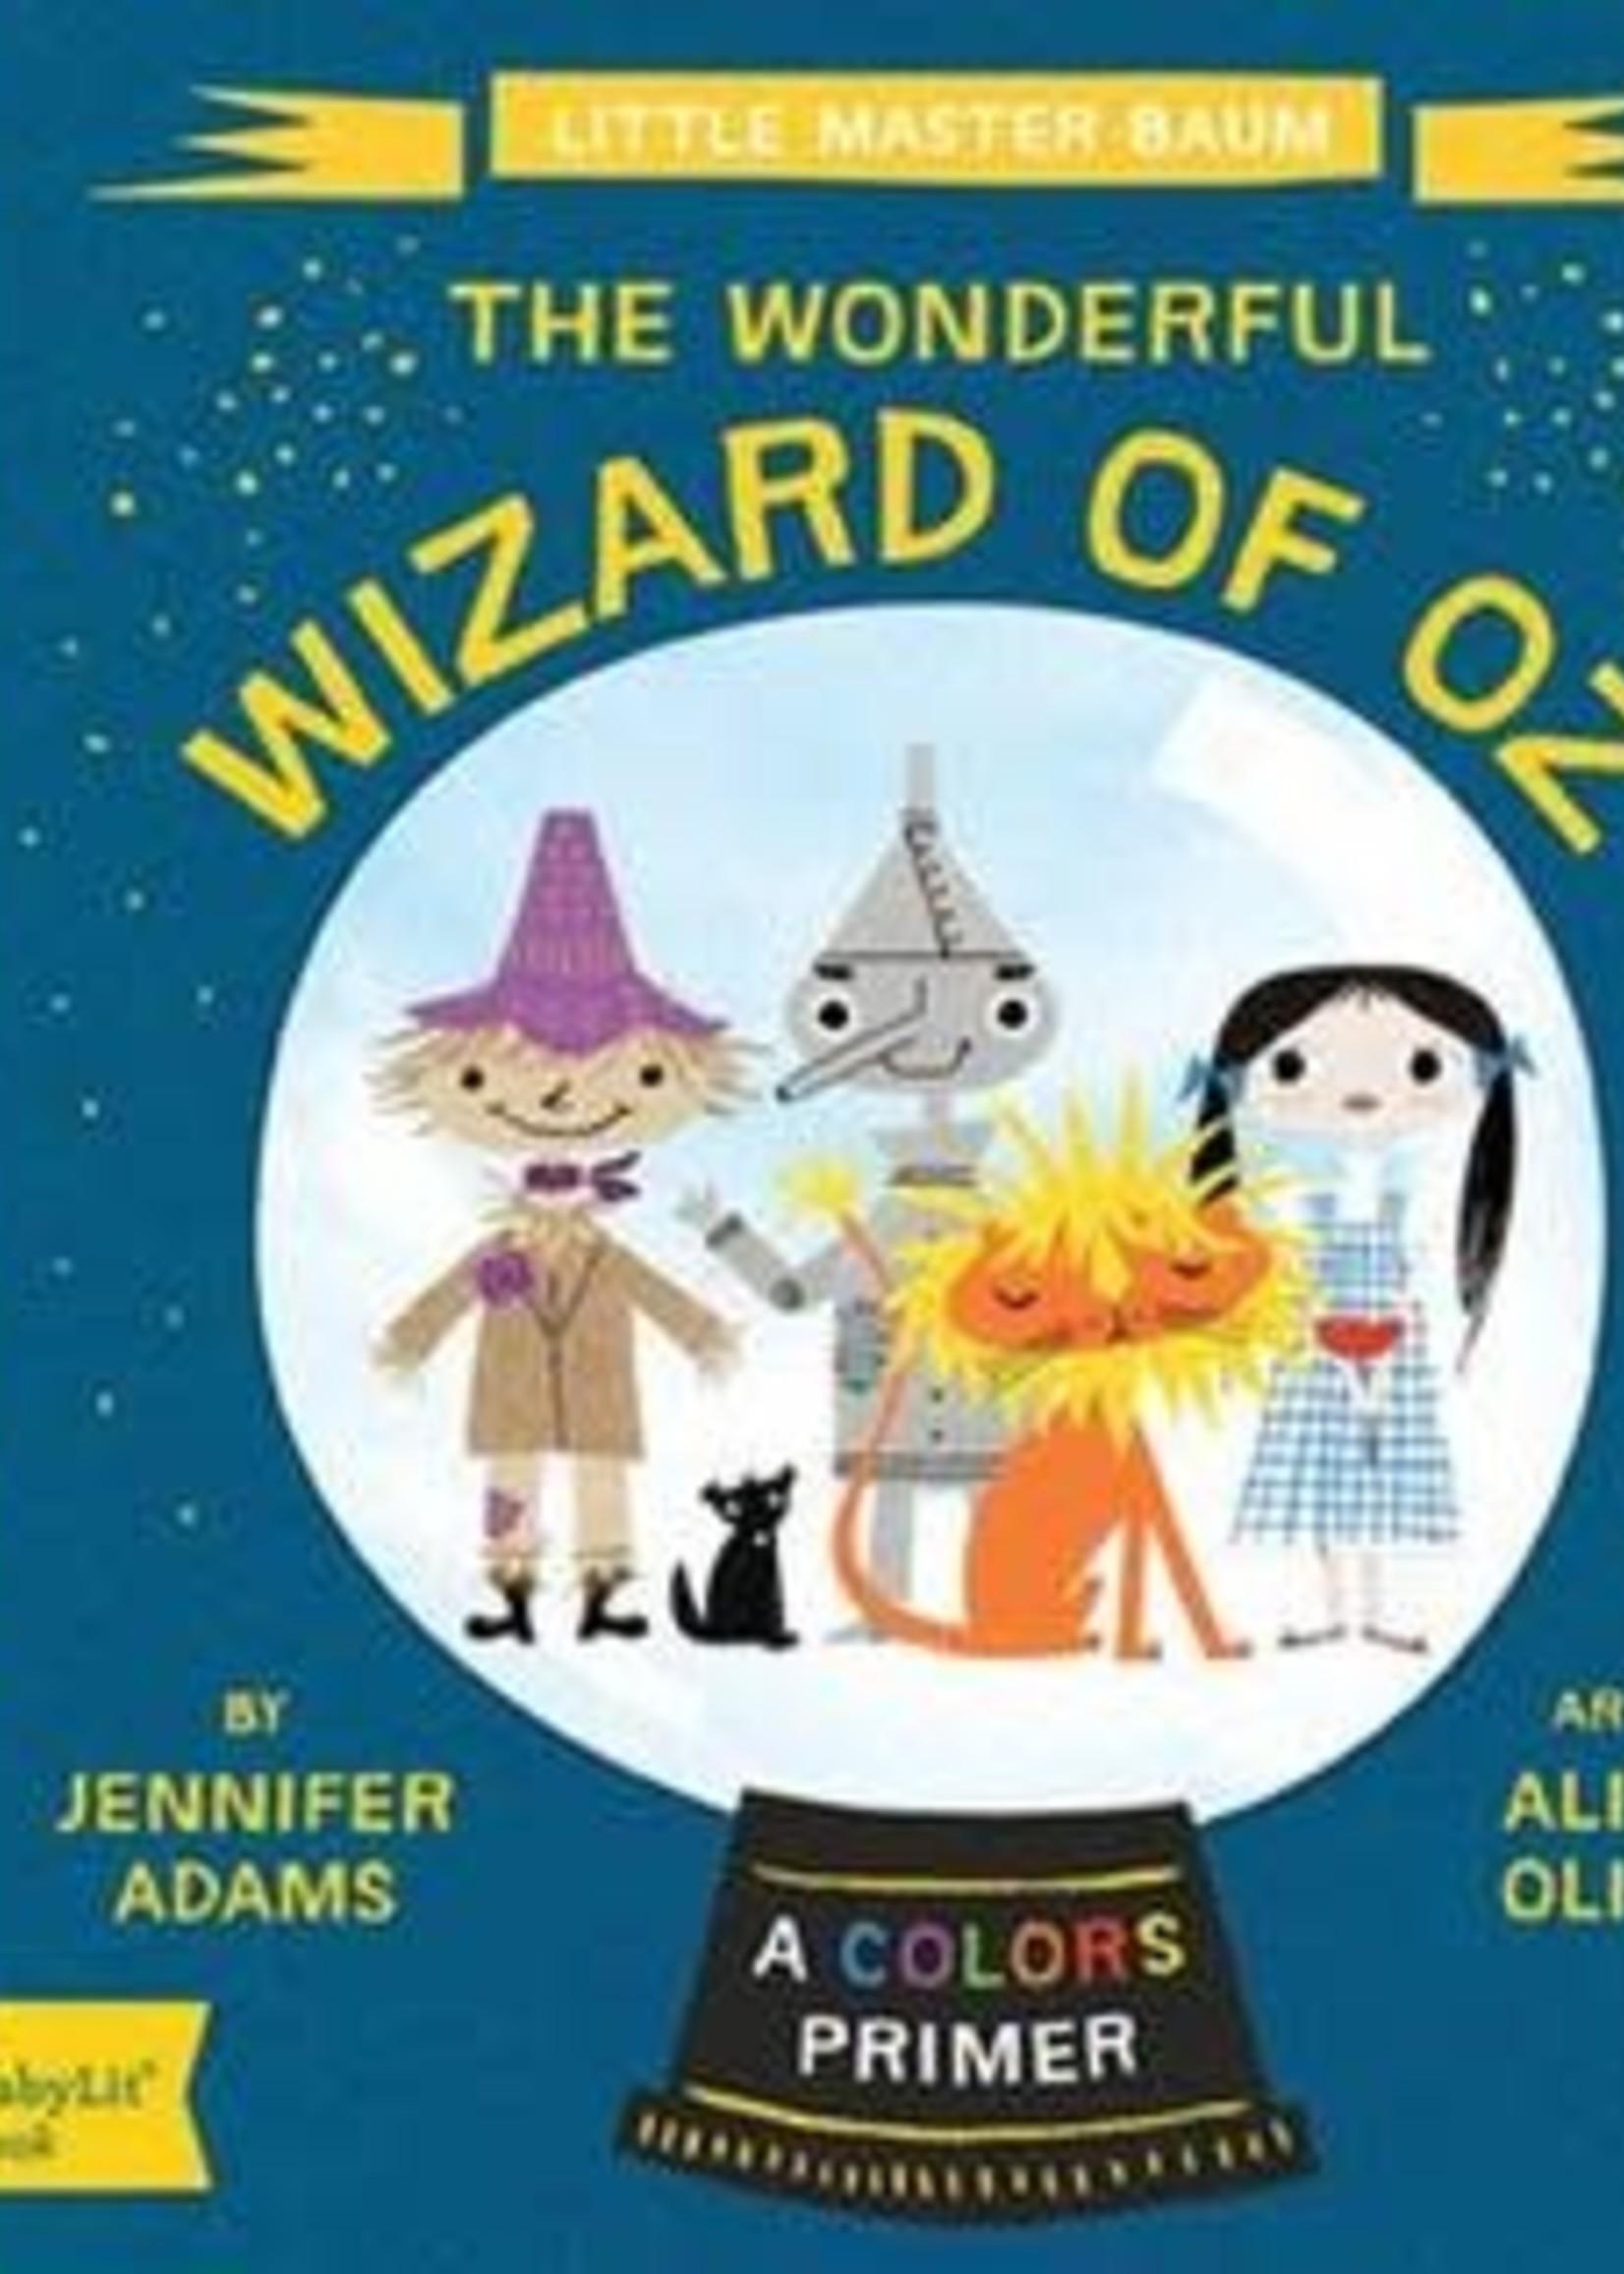 The Wonderful Wizard of Oz: A BabyLit® Colors Primer by Jennifer Adams,  Alison Oliver